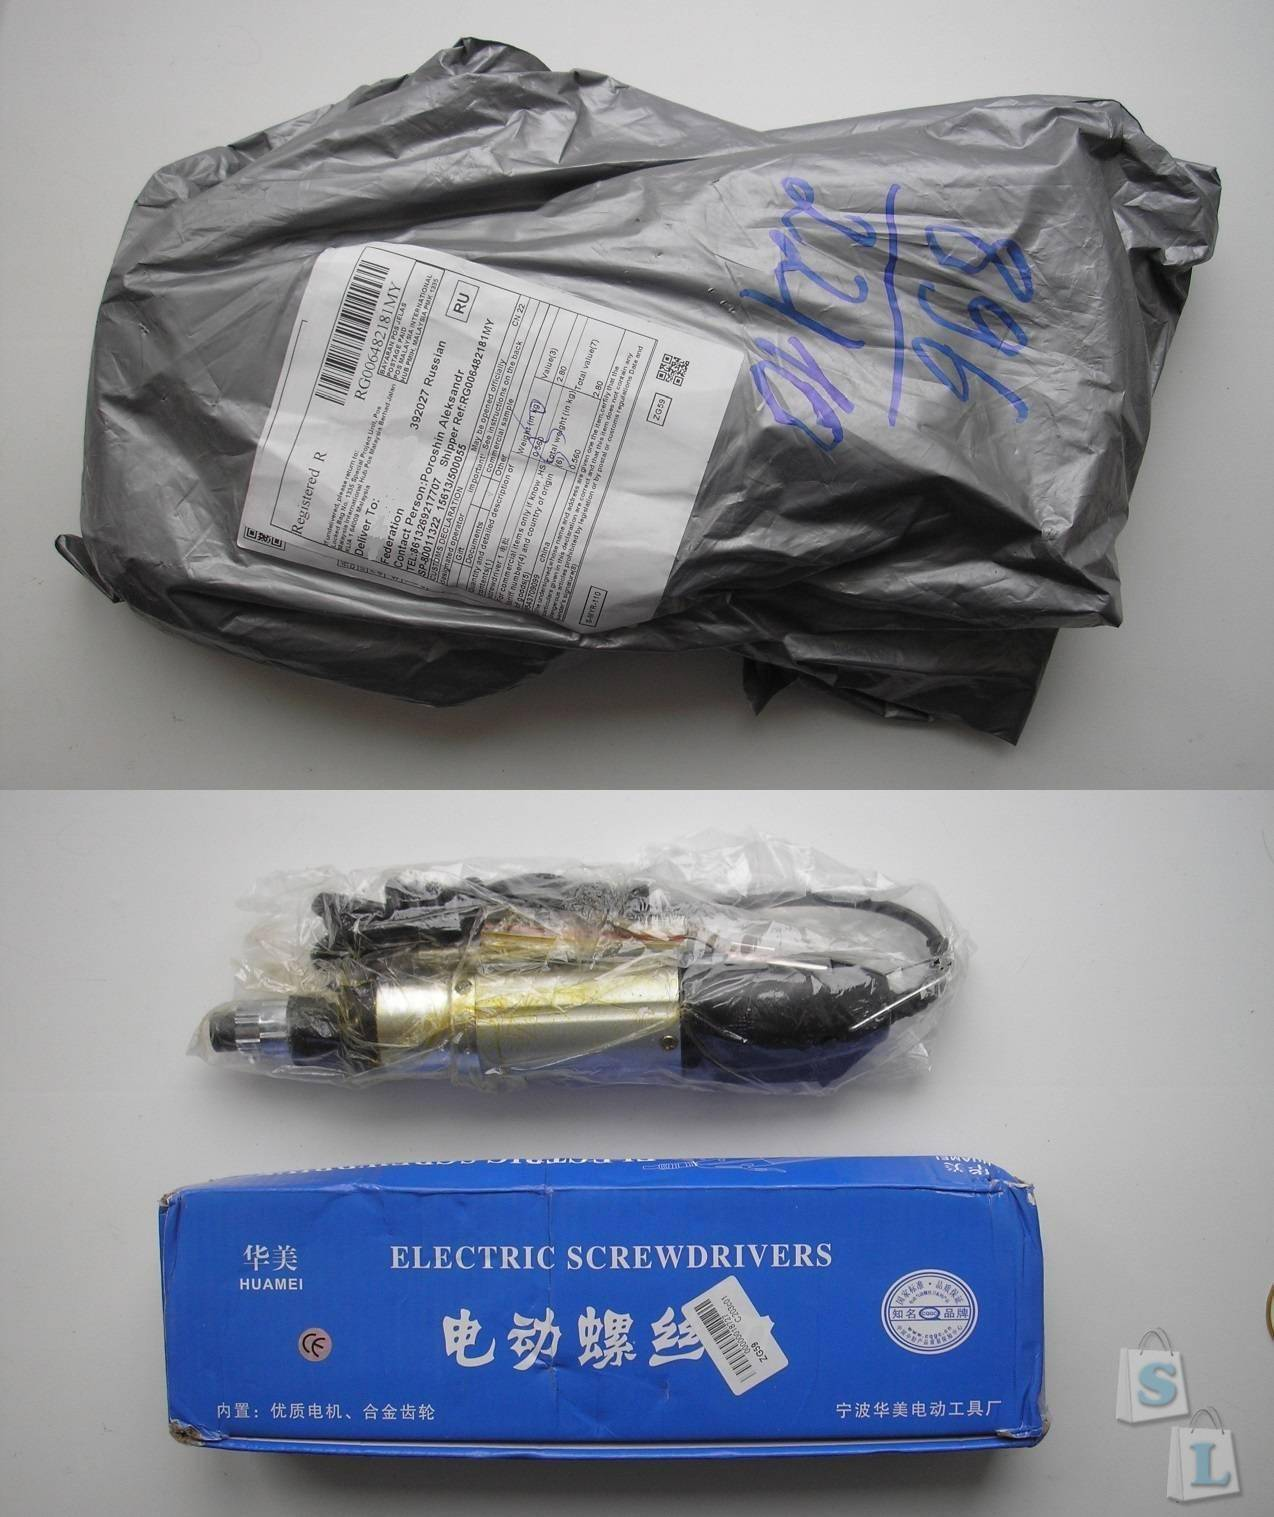 EachBuyer: Электрическая отвёртка WJ 800